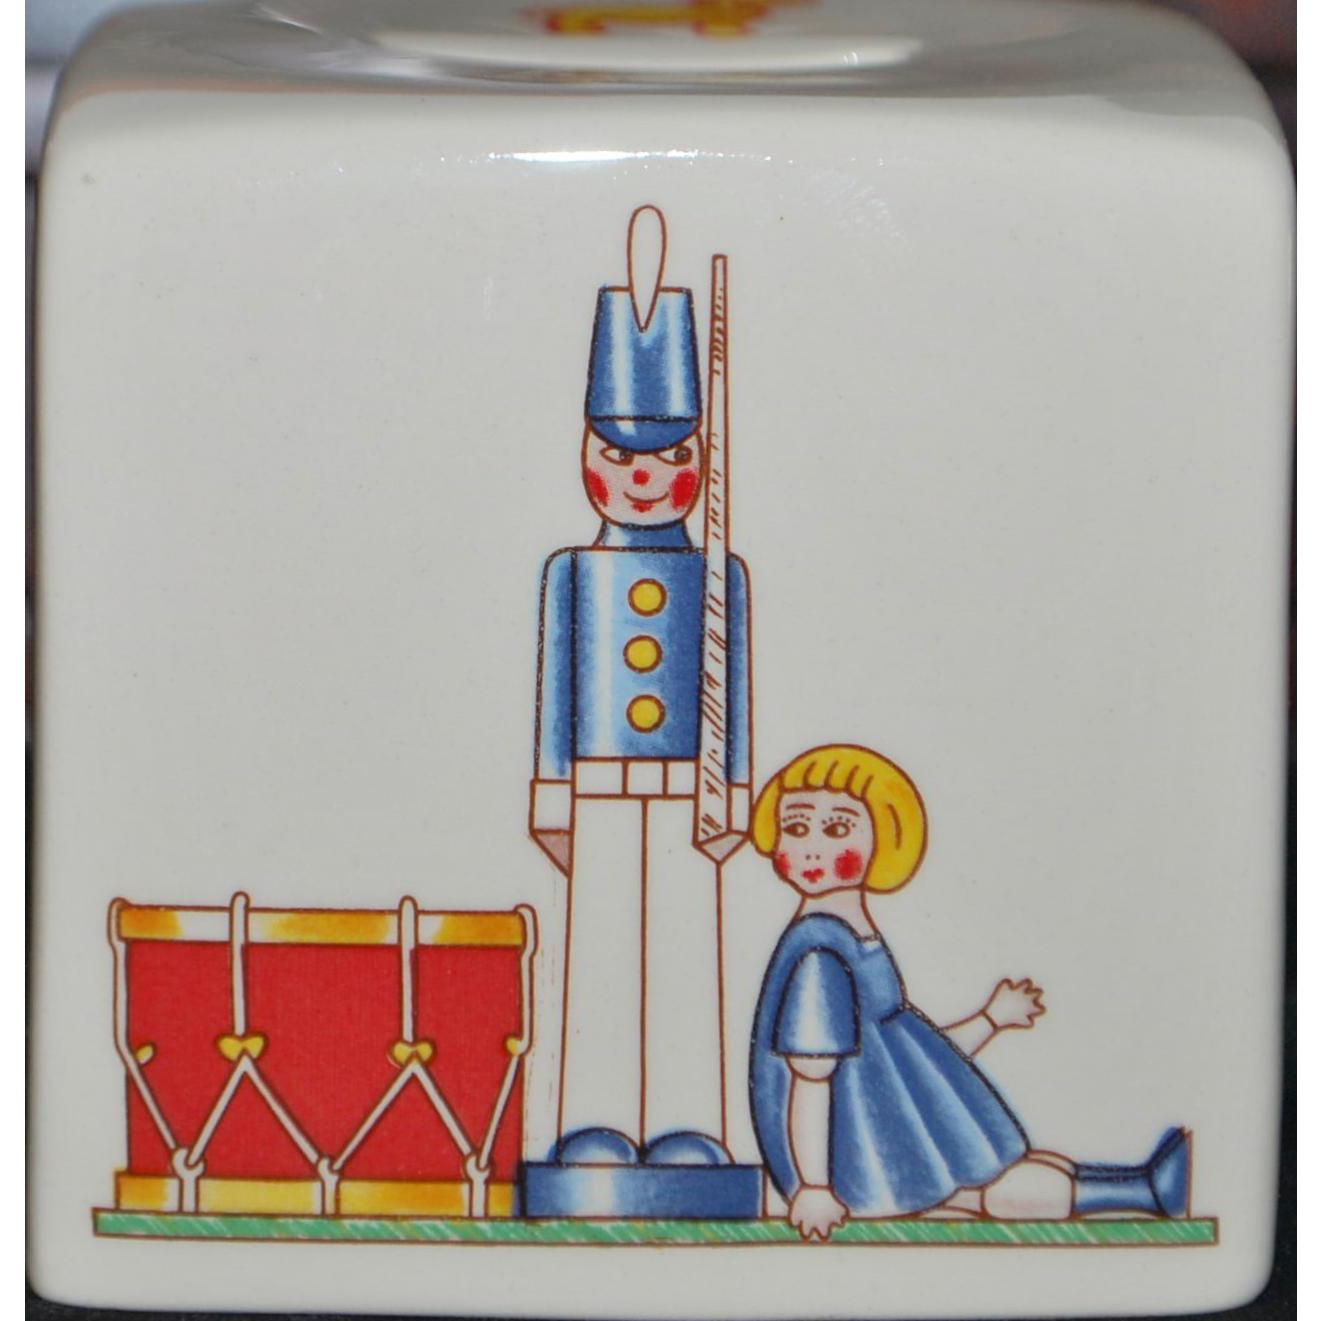 Tiffany & Co. Mason's of England Toy Child's Bank